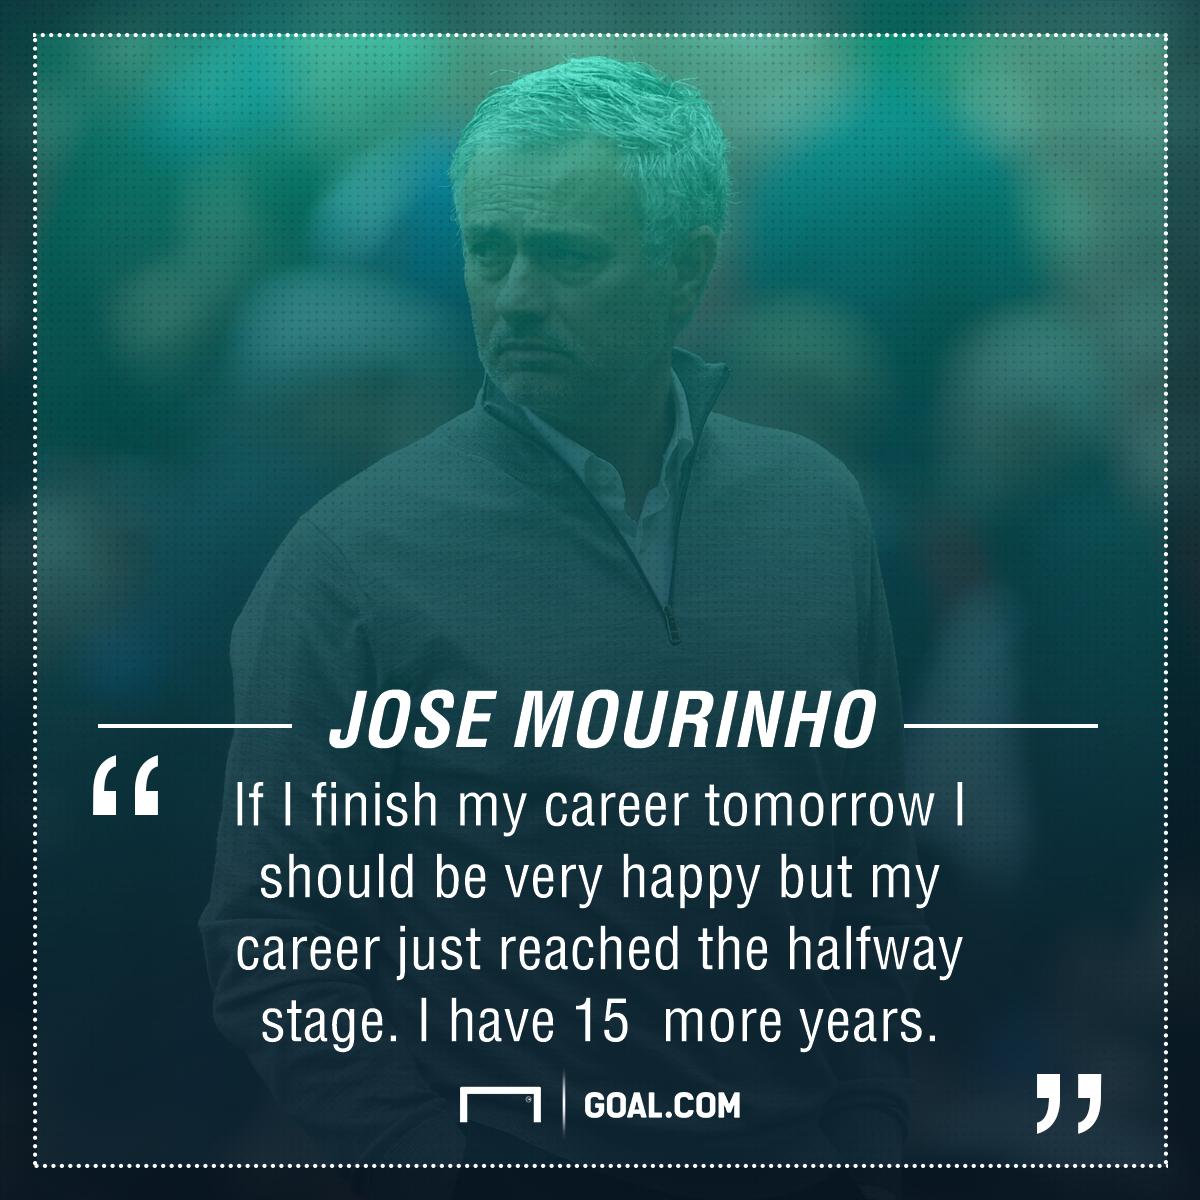 Jose Mourinho 15 years